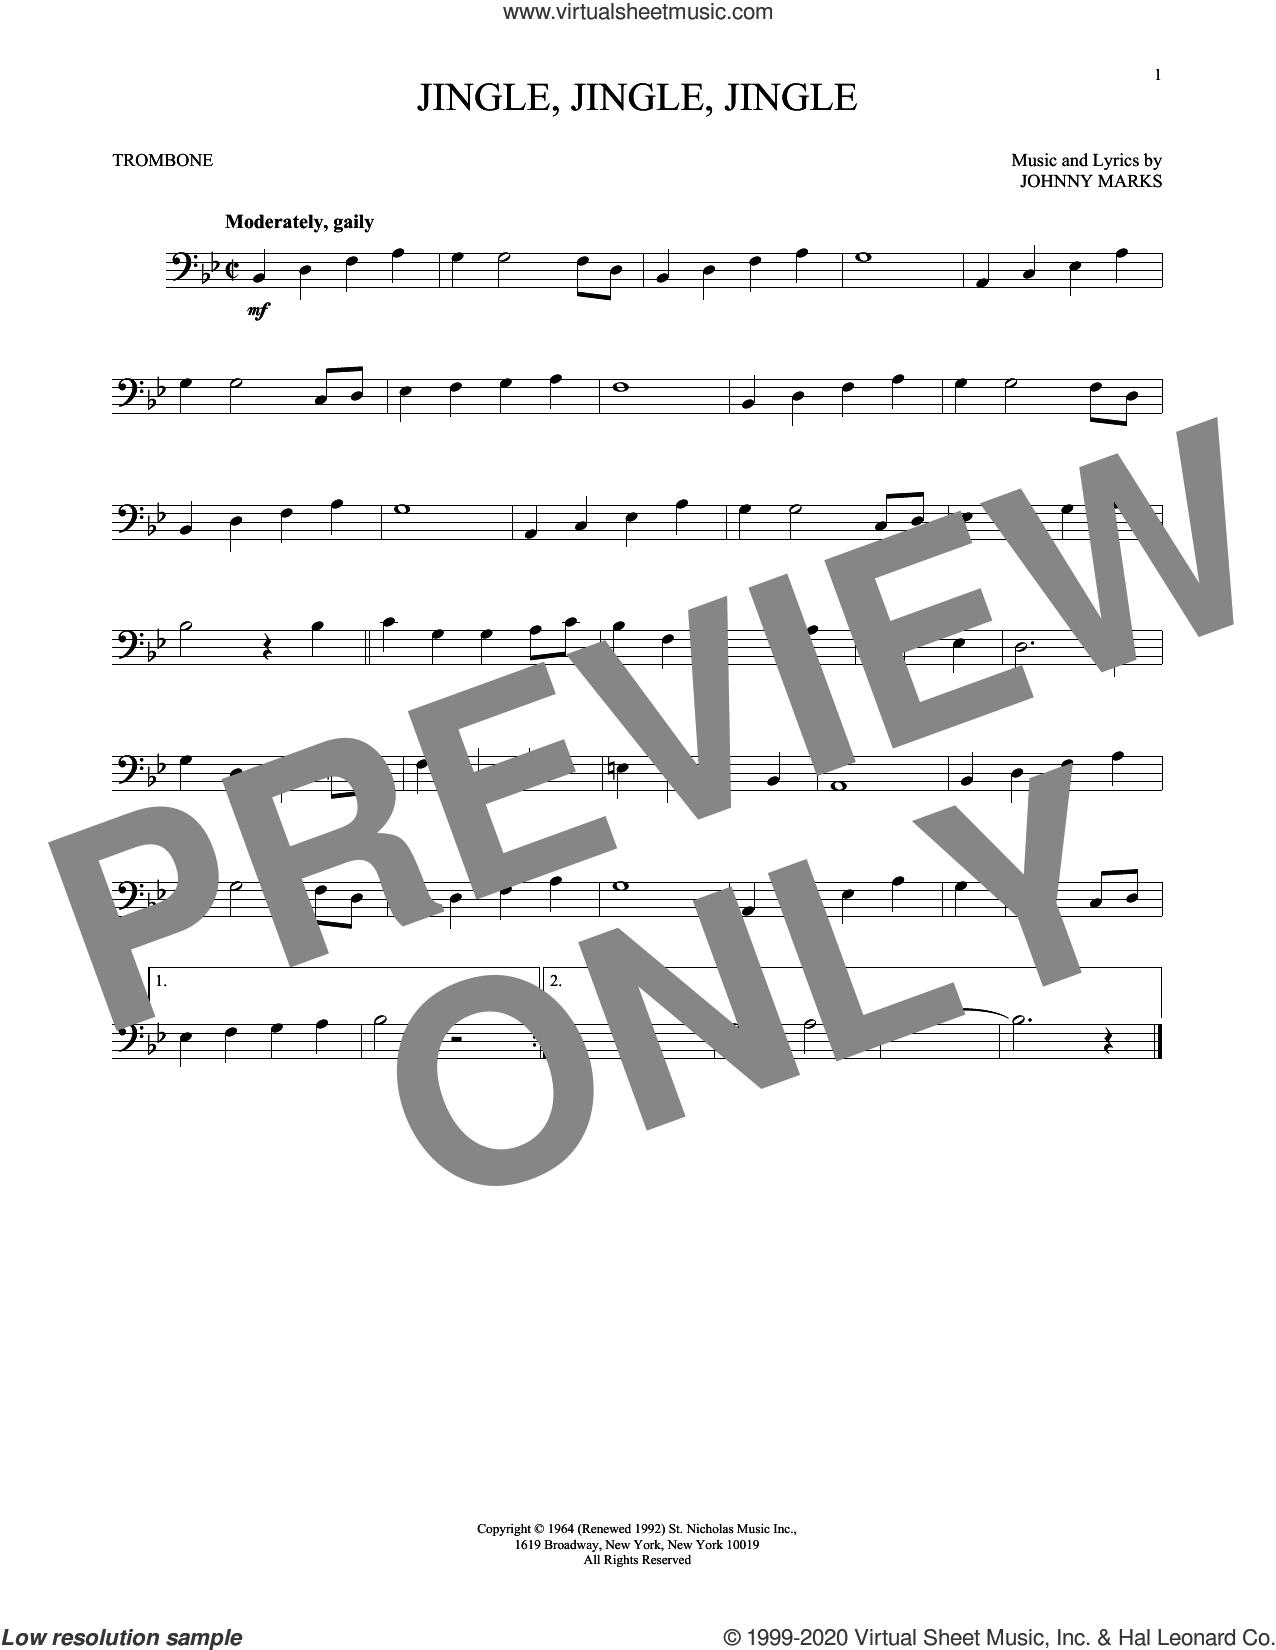 Jingle, Jingle, Jingle sheet music for trombone solo by Johnny Marks, intermediate skill level